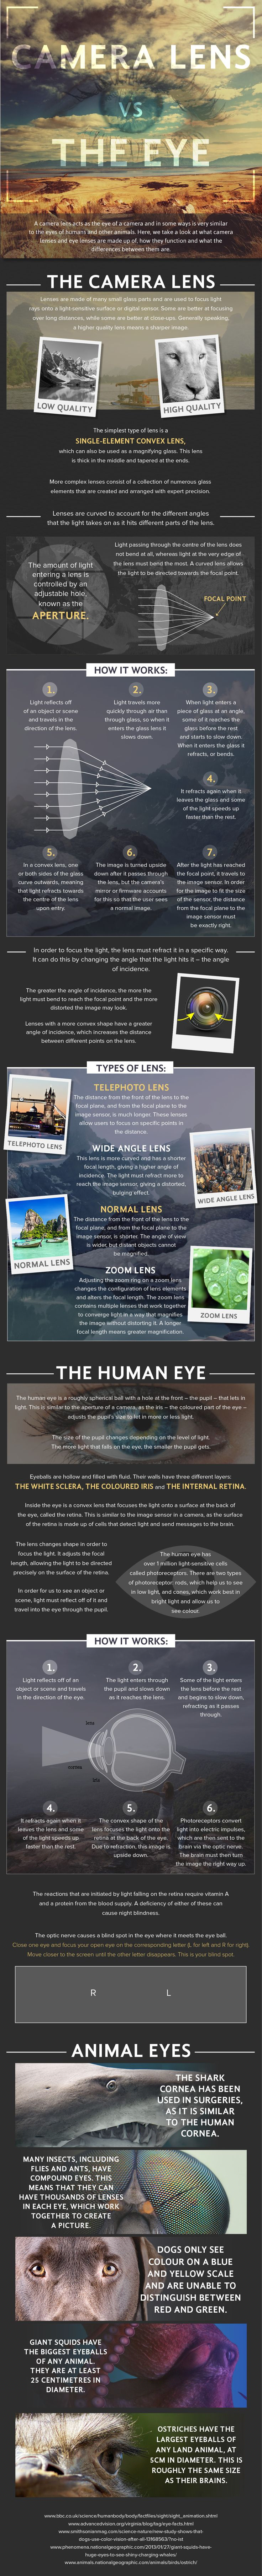 Camera Lens vs. The Eye 1